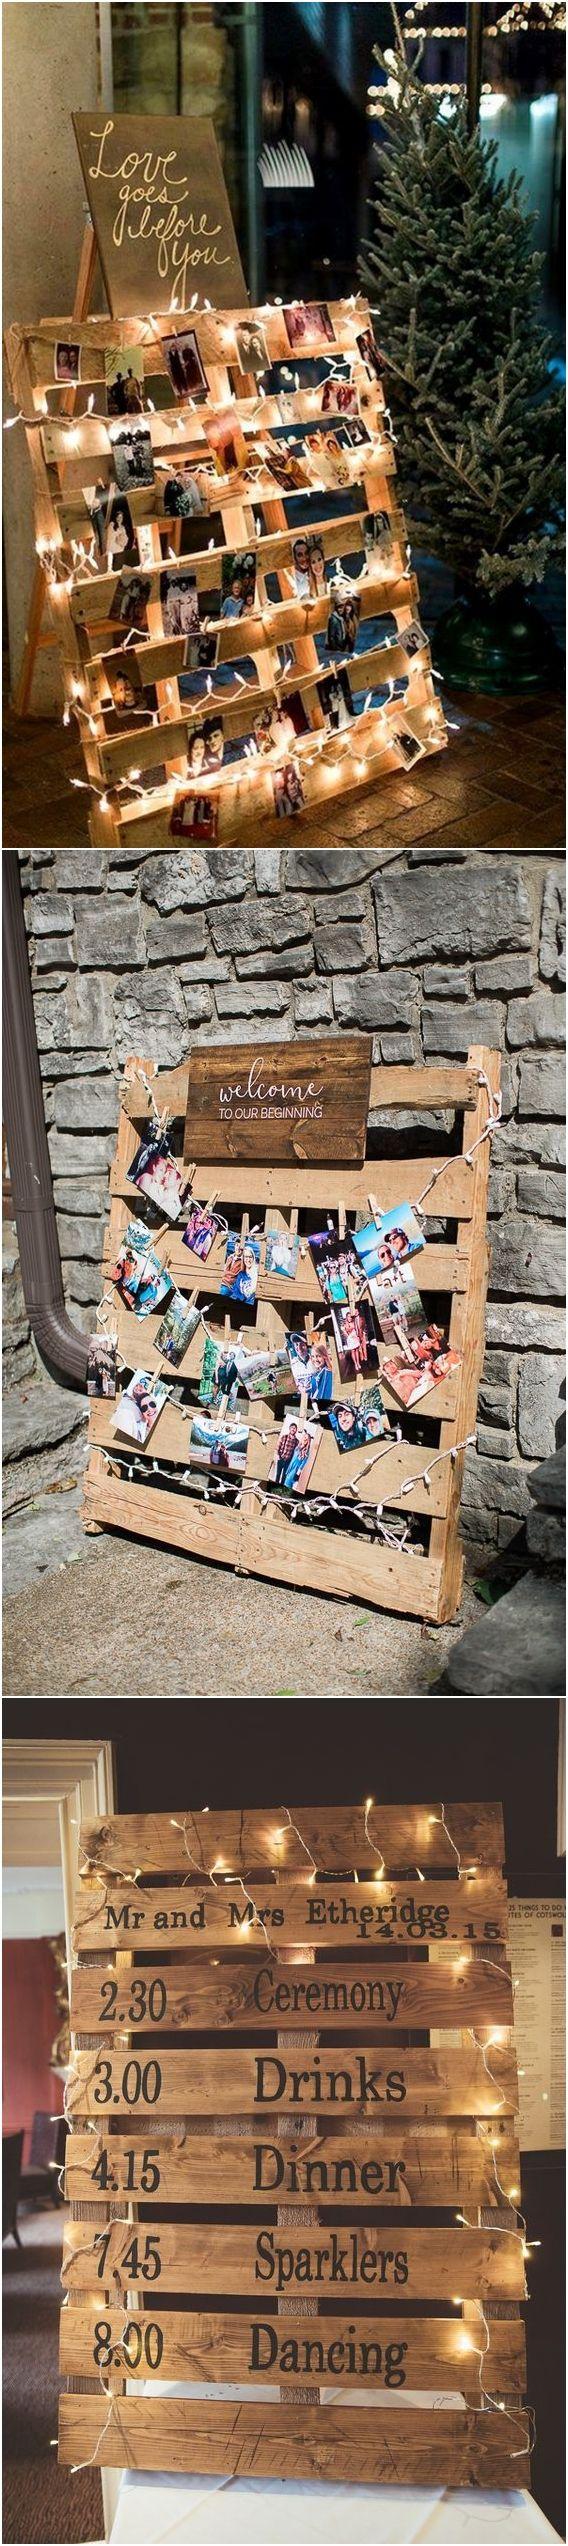 Pallet wedding decor ideas  Top  Rustic Country Wooden Pallet Wedding Ideas  Country Weddings